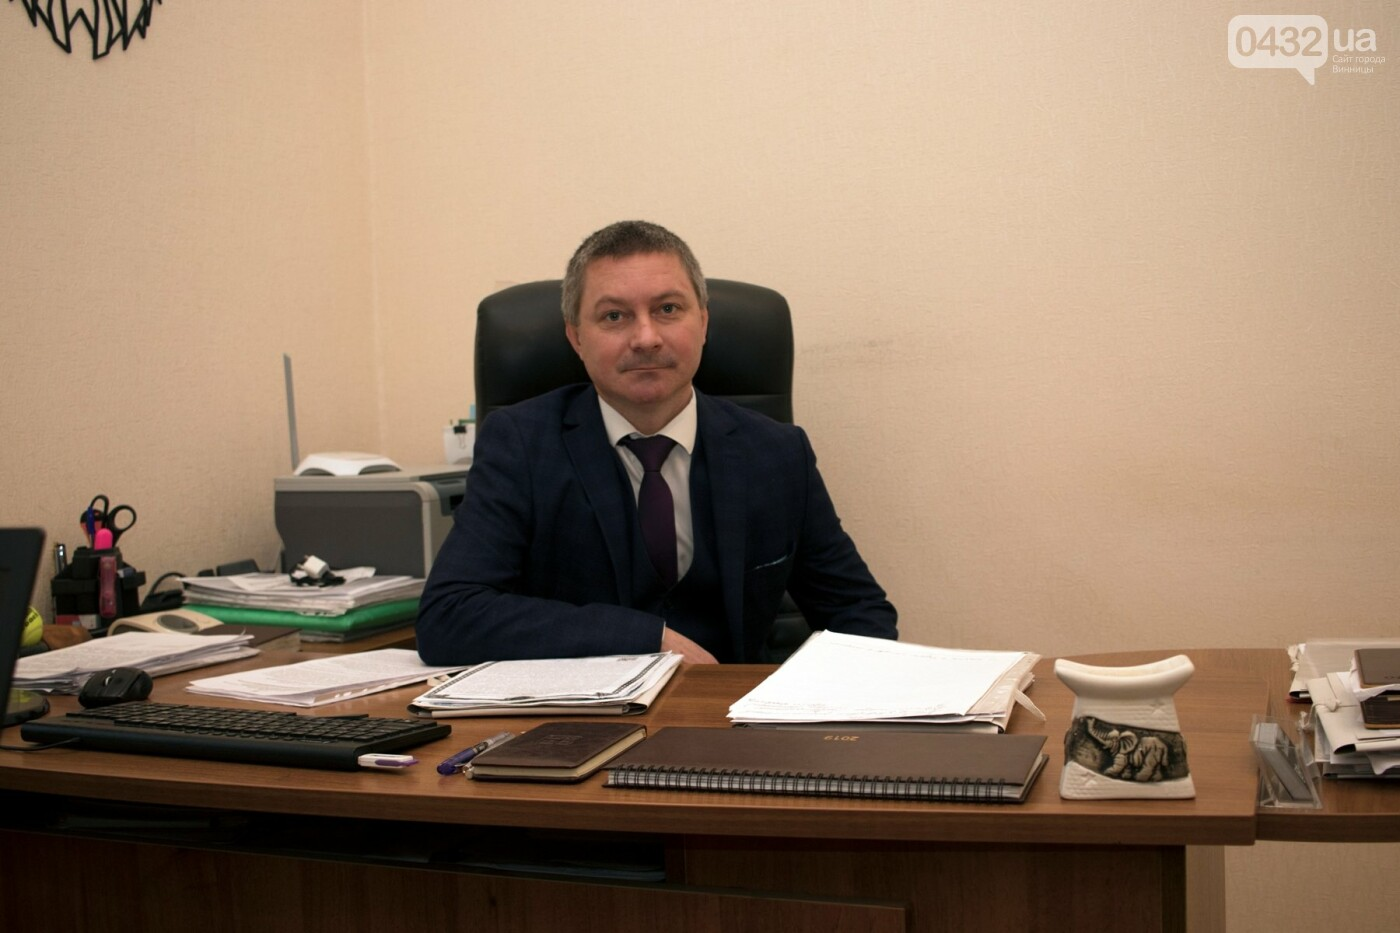 Как адвокаты избавили клиента от долгов: адвокат по кредитам Винница, фото-4